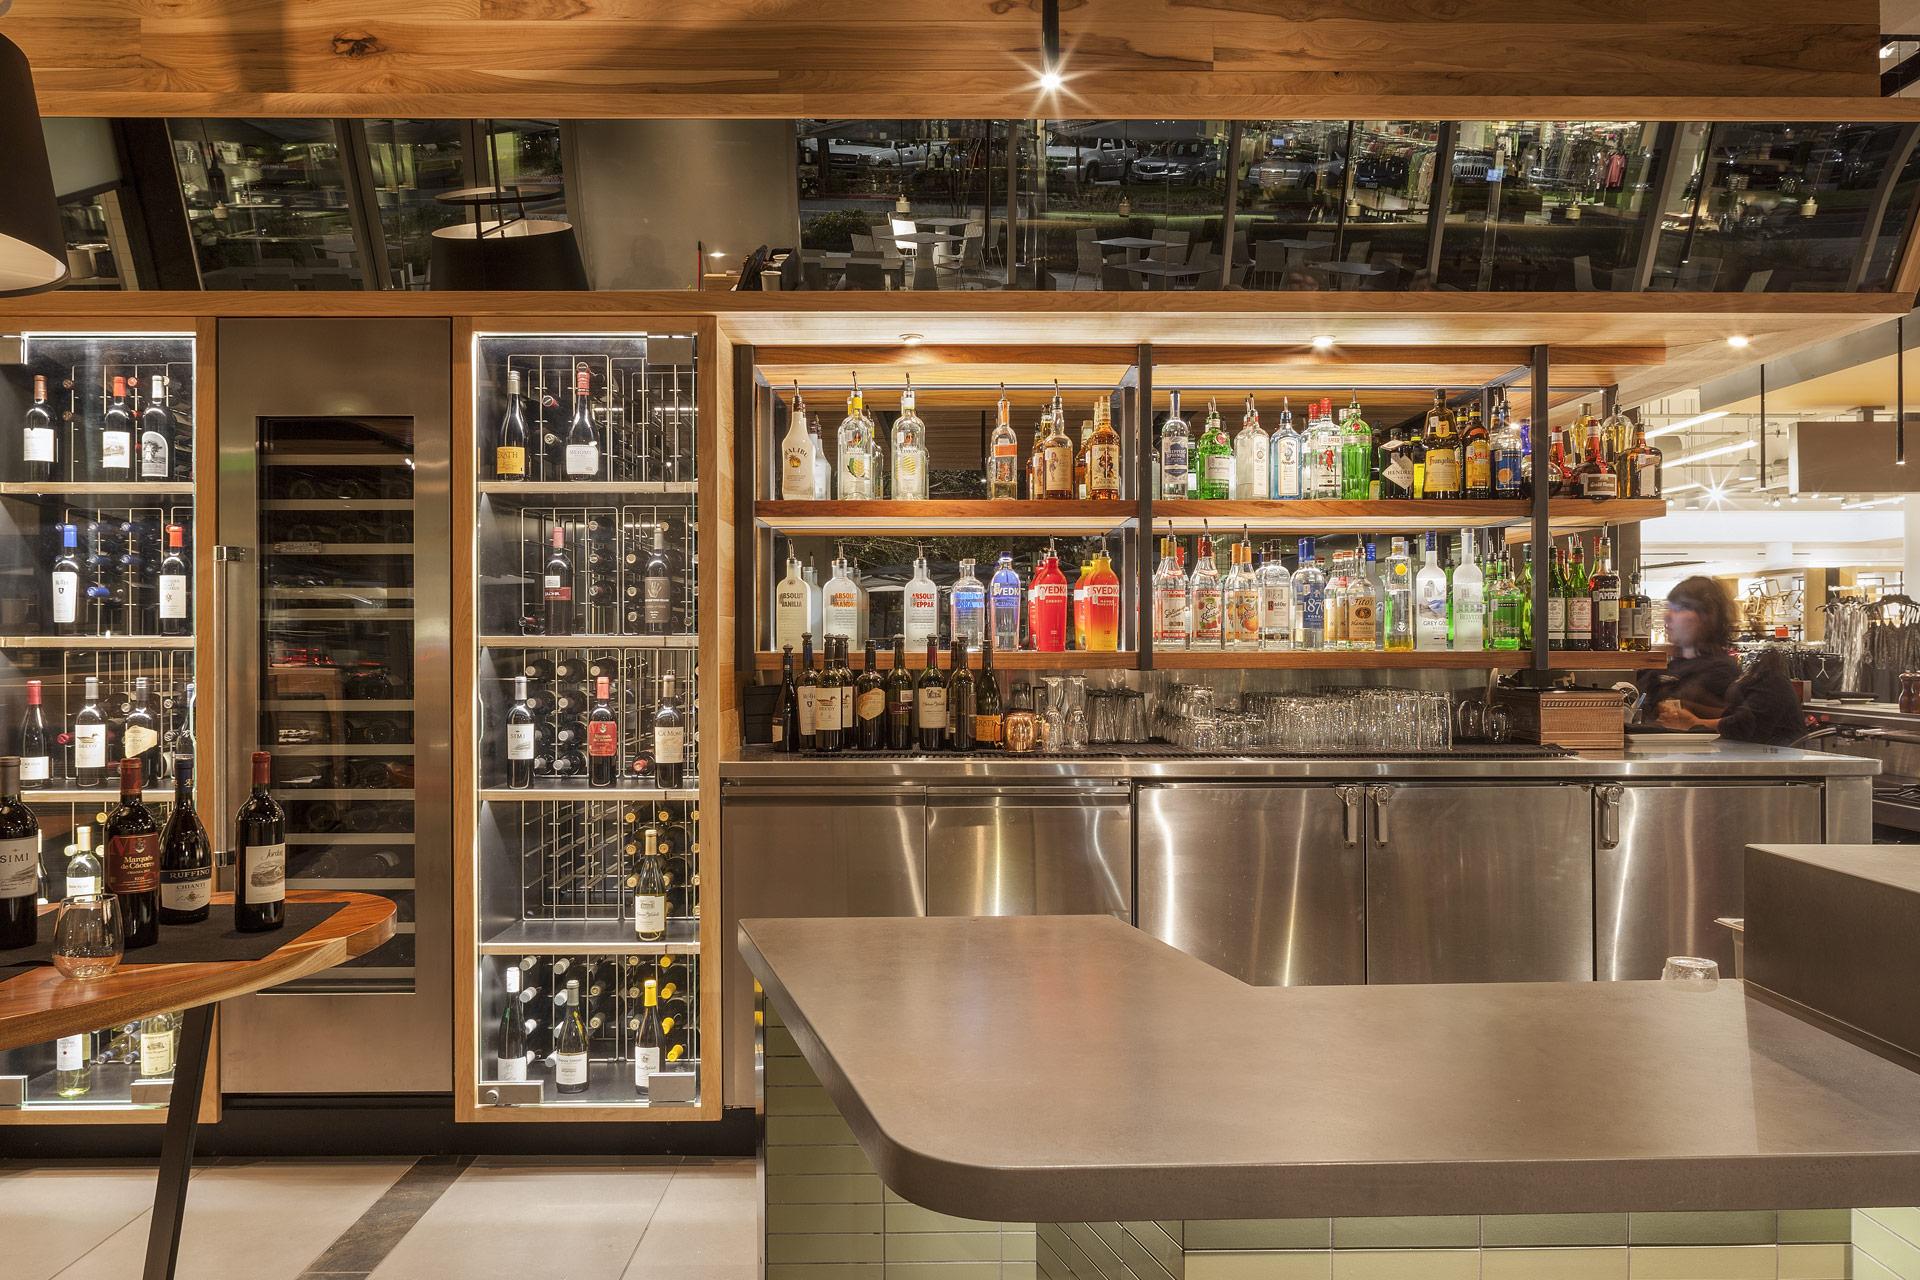 Bazille at Nordstrom Restaurant interiors